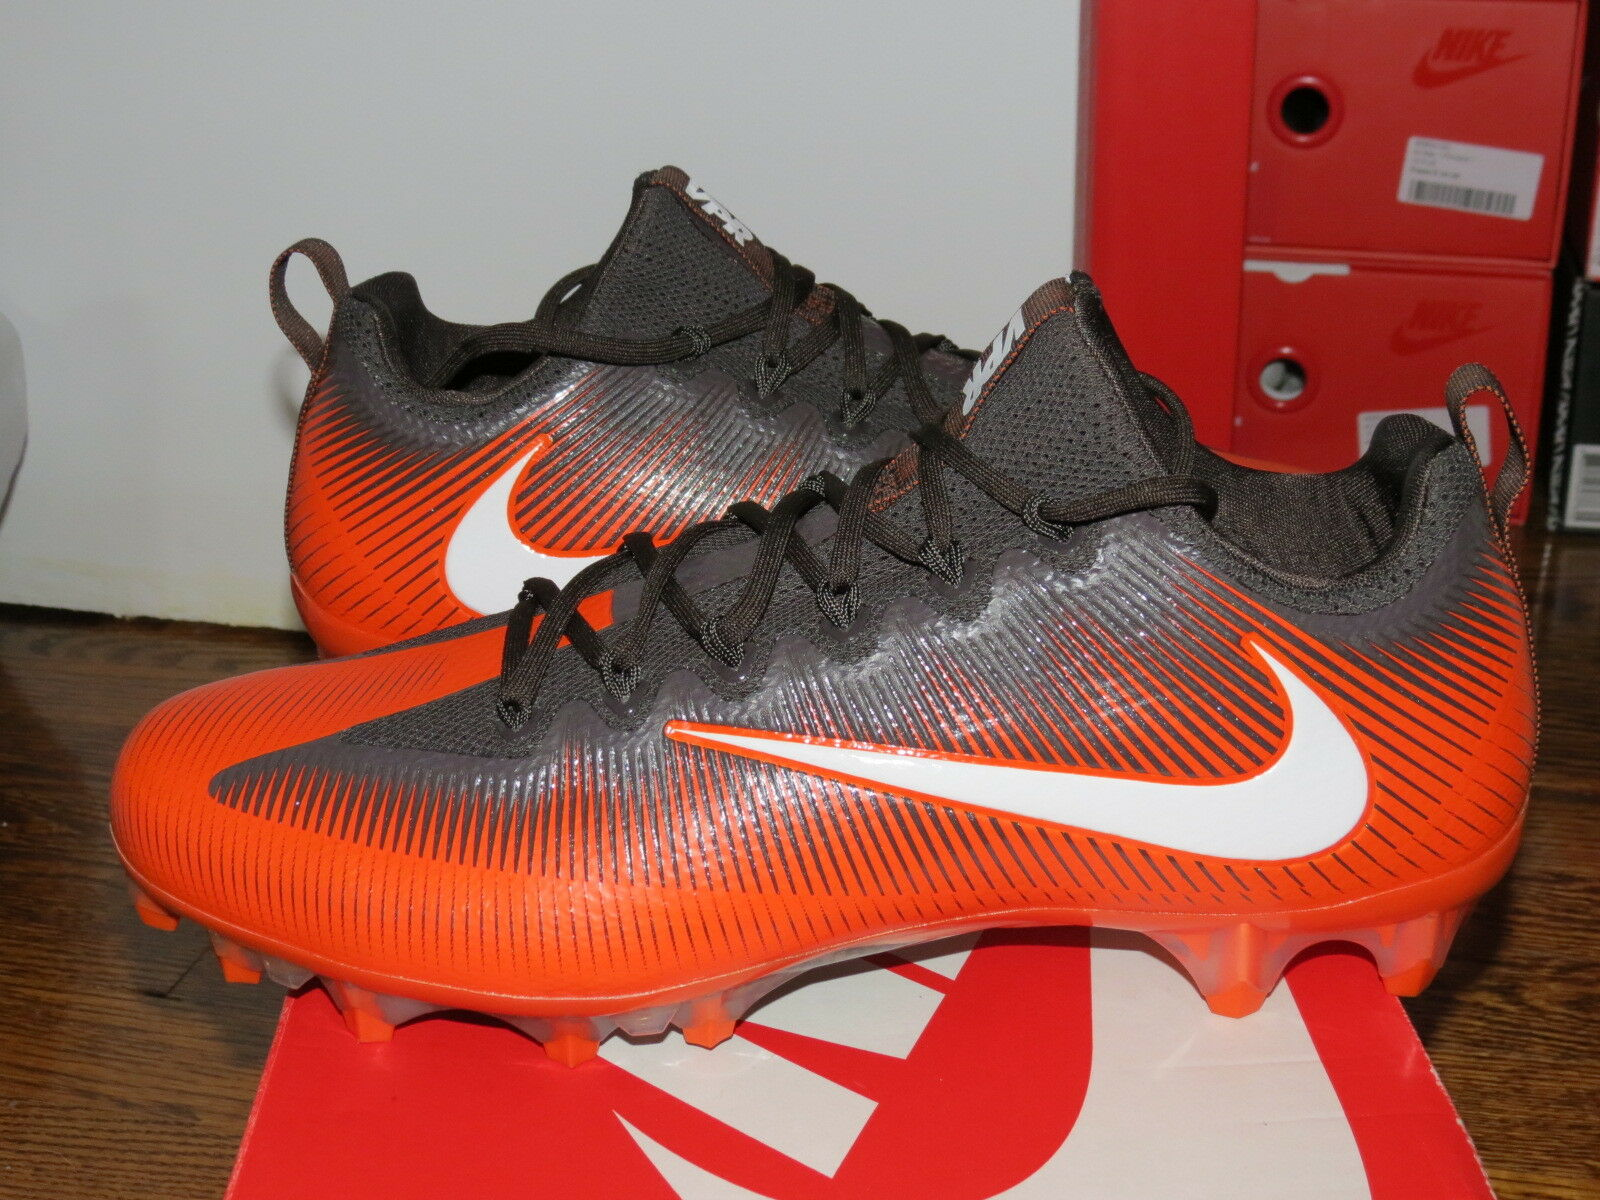 Nike Vapor VPR Untouchable Pro Low Football Cleats 925423-808 SZ 12 orange Brown